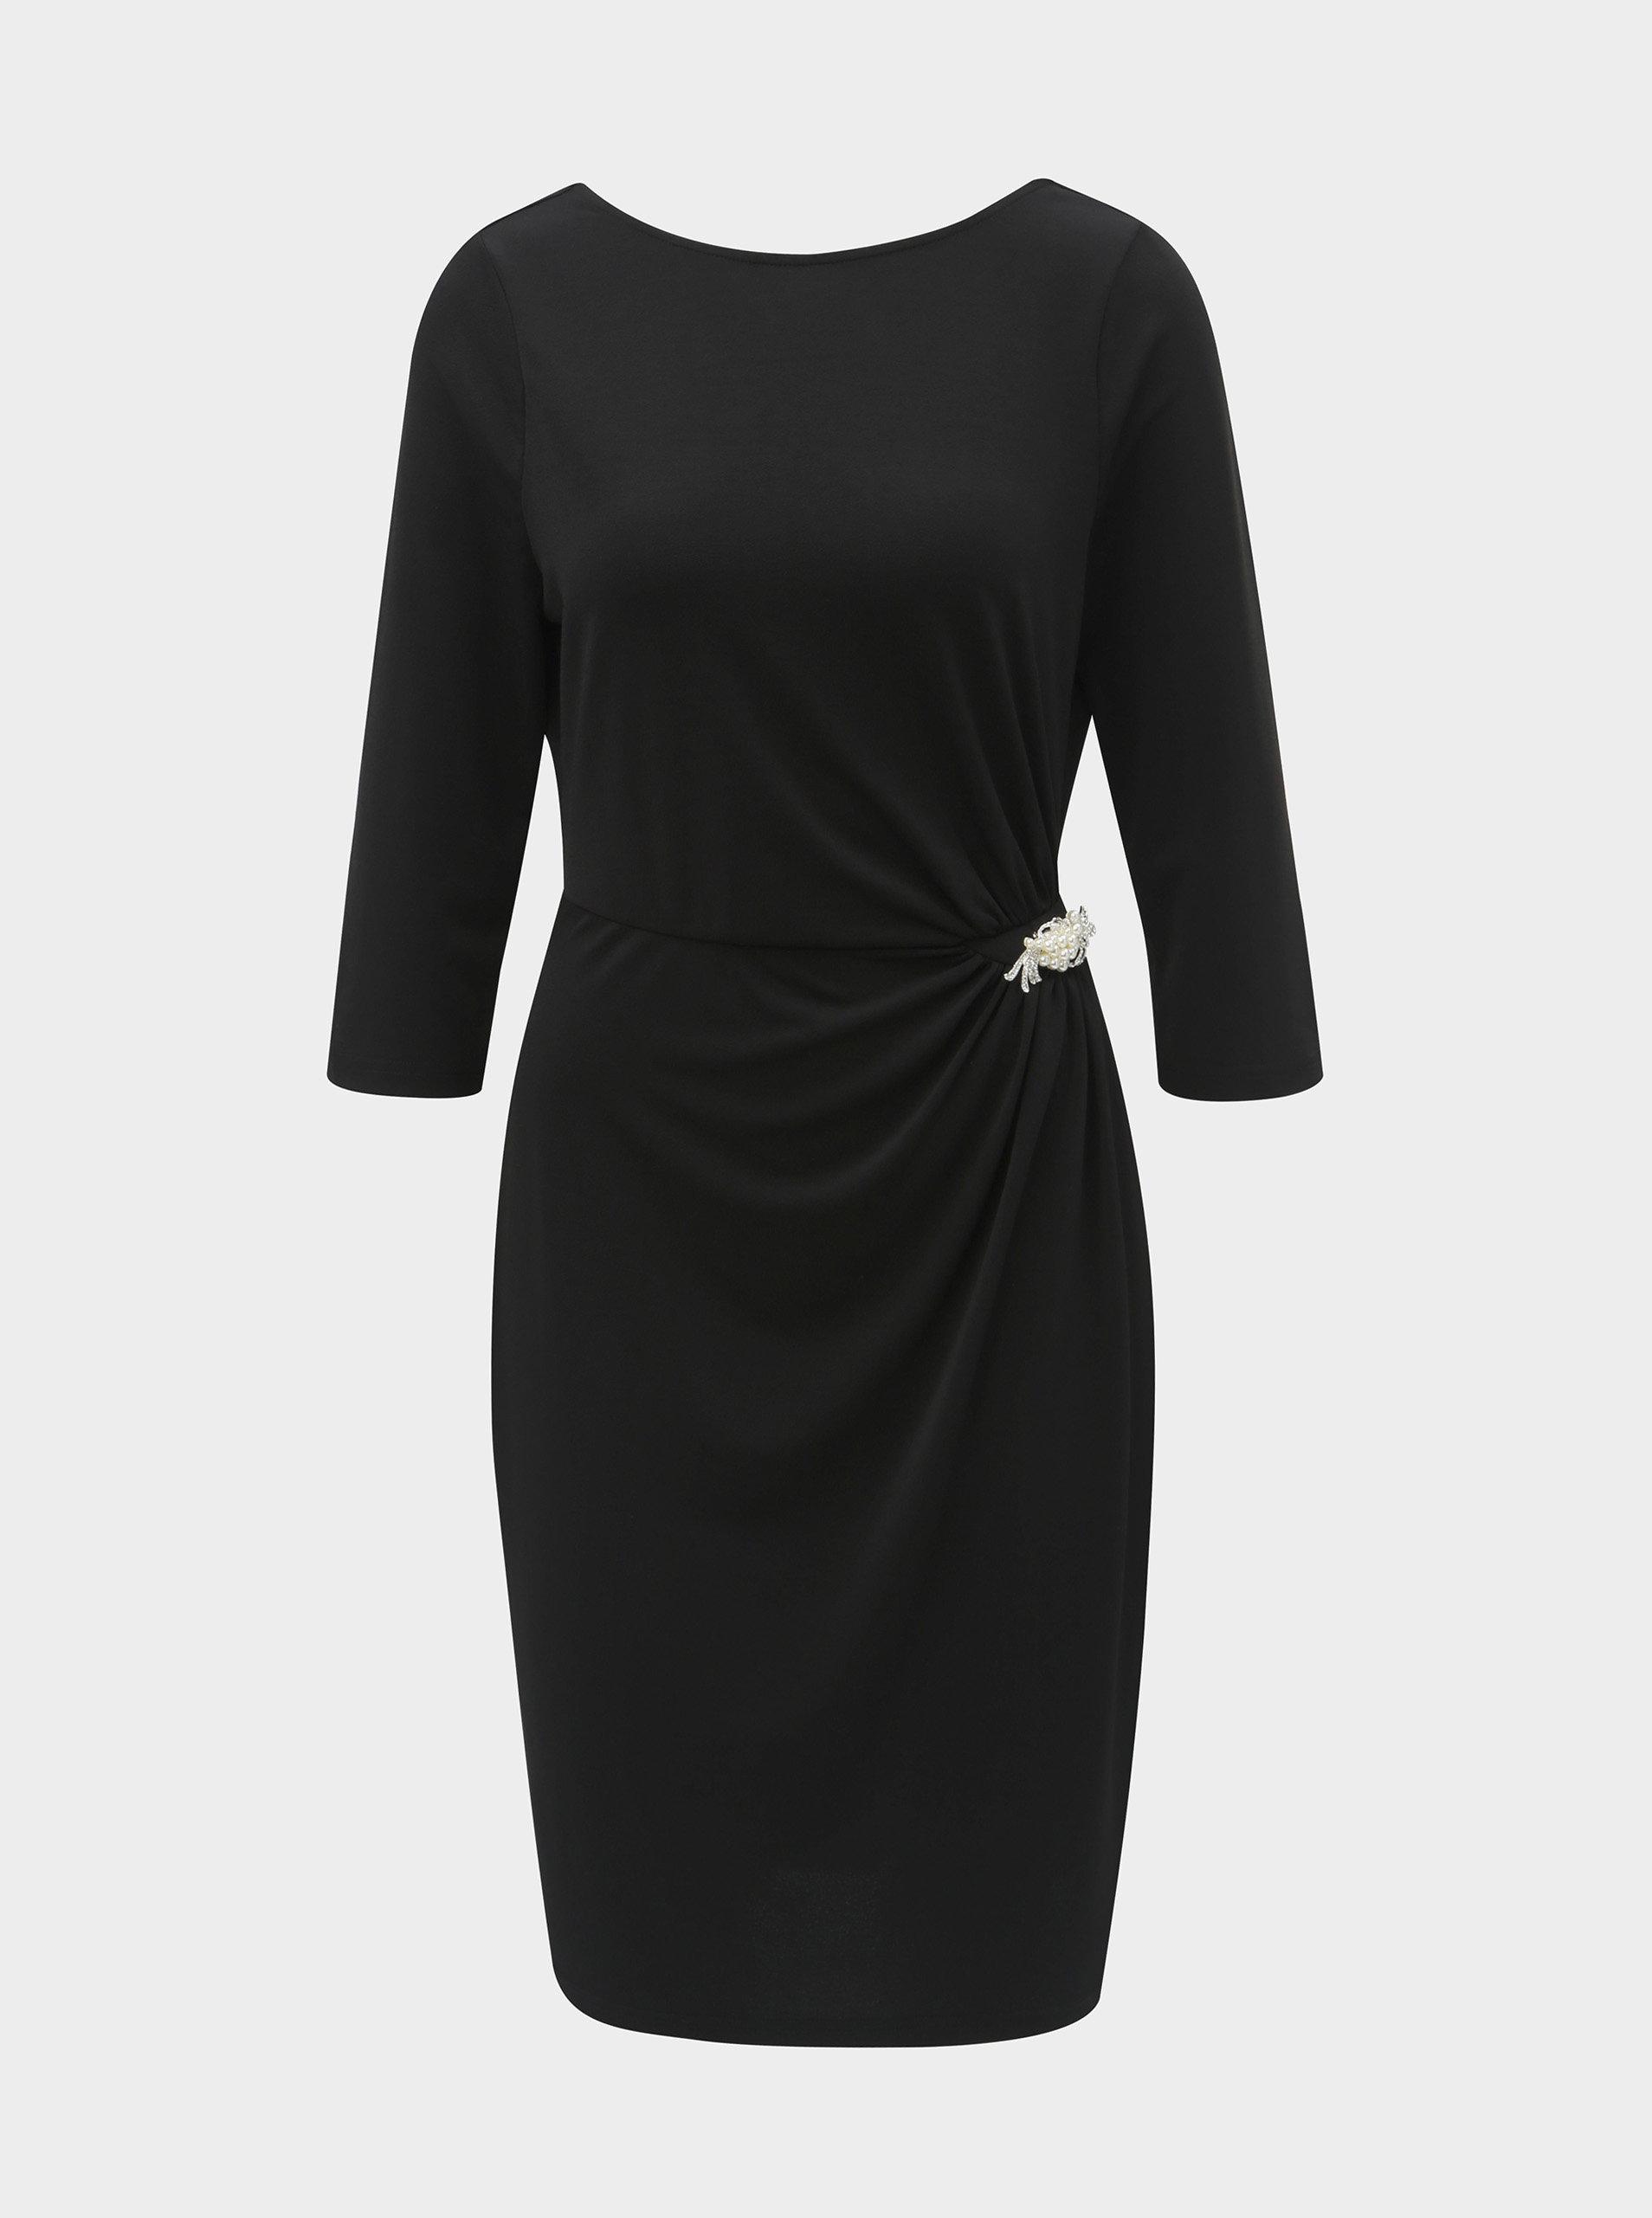 0e0e88cce81 Černé pouzdrové šaty s broží a řasením na boku Dorothy Perkins ...